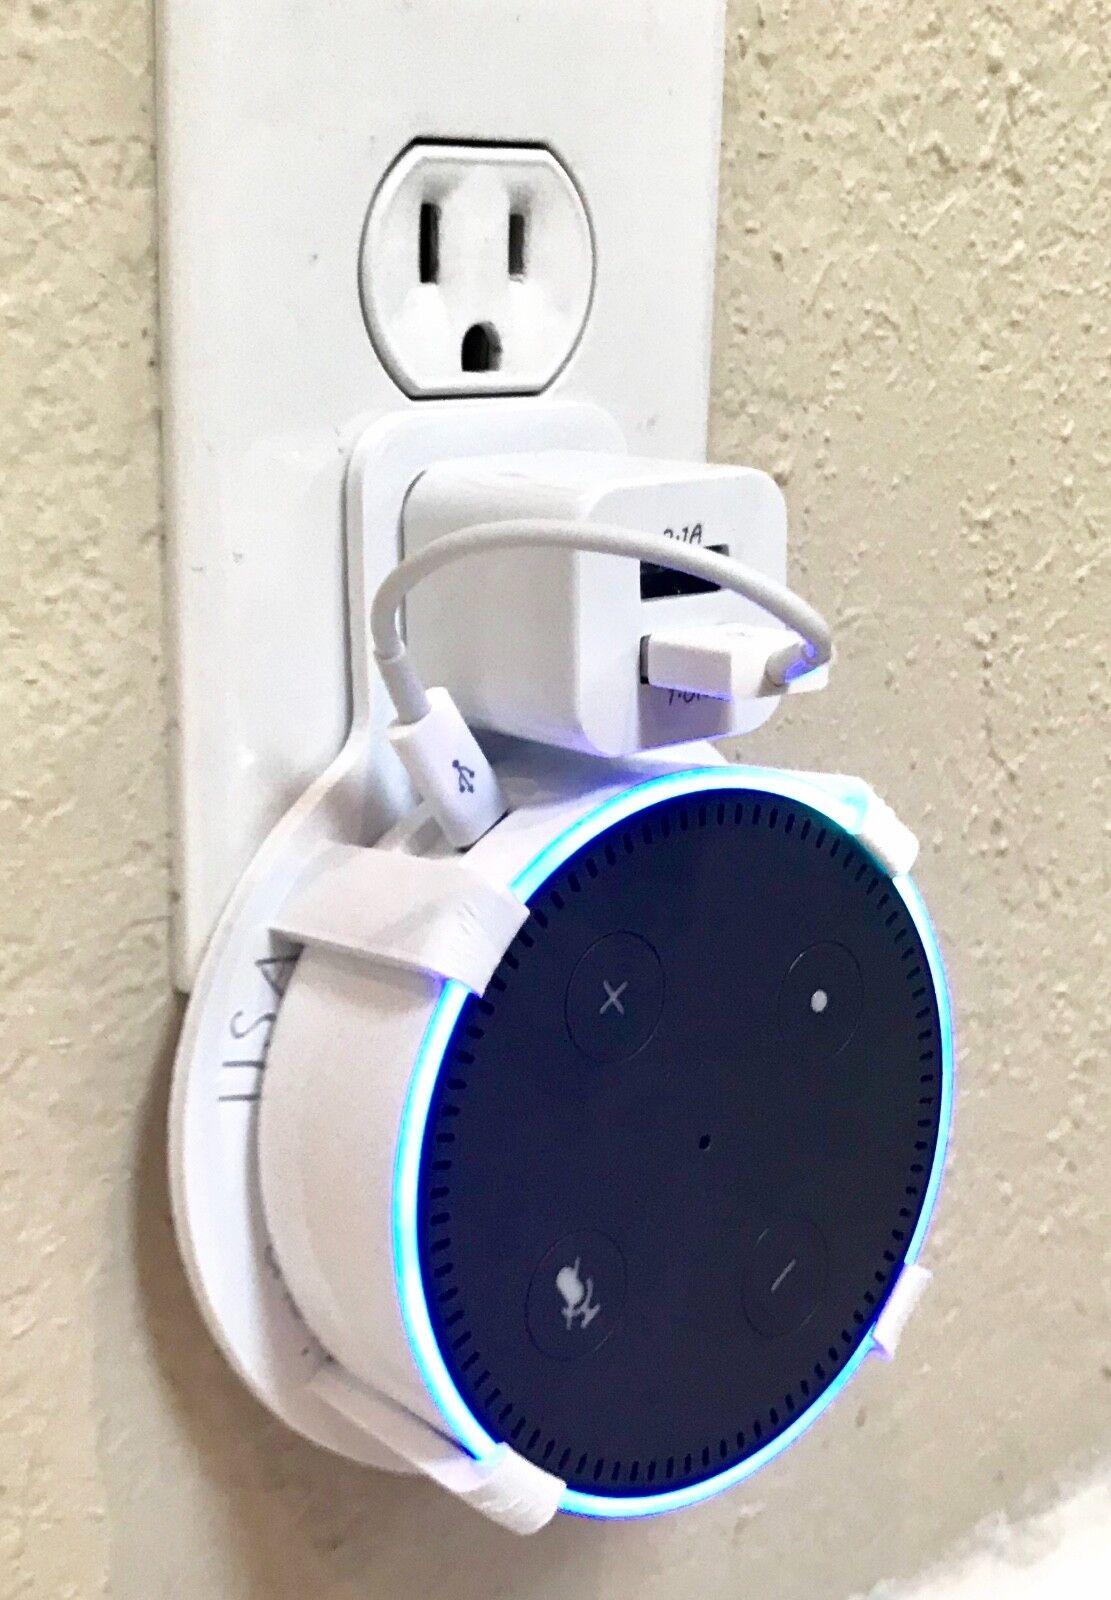 Twin USB Port PLUG-IN Wall Mount for Amazon Echo Dot 2nd Gen (White)